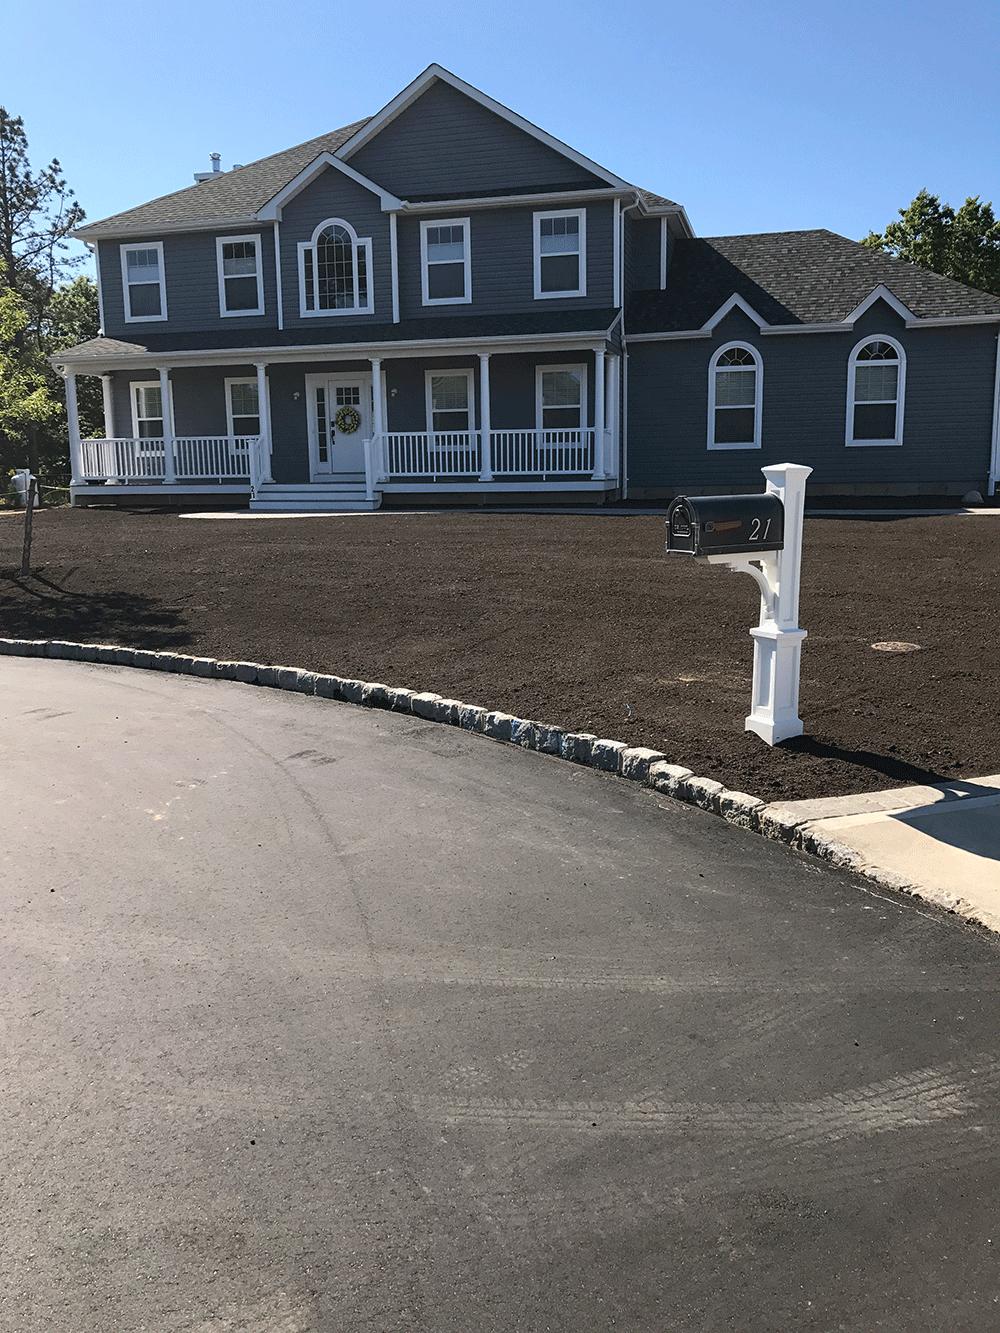 soil on graded property